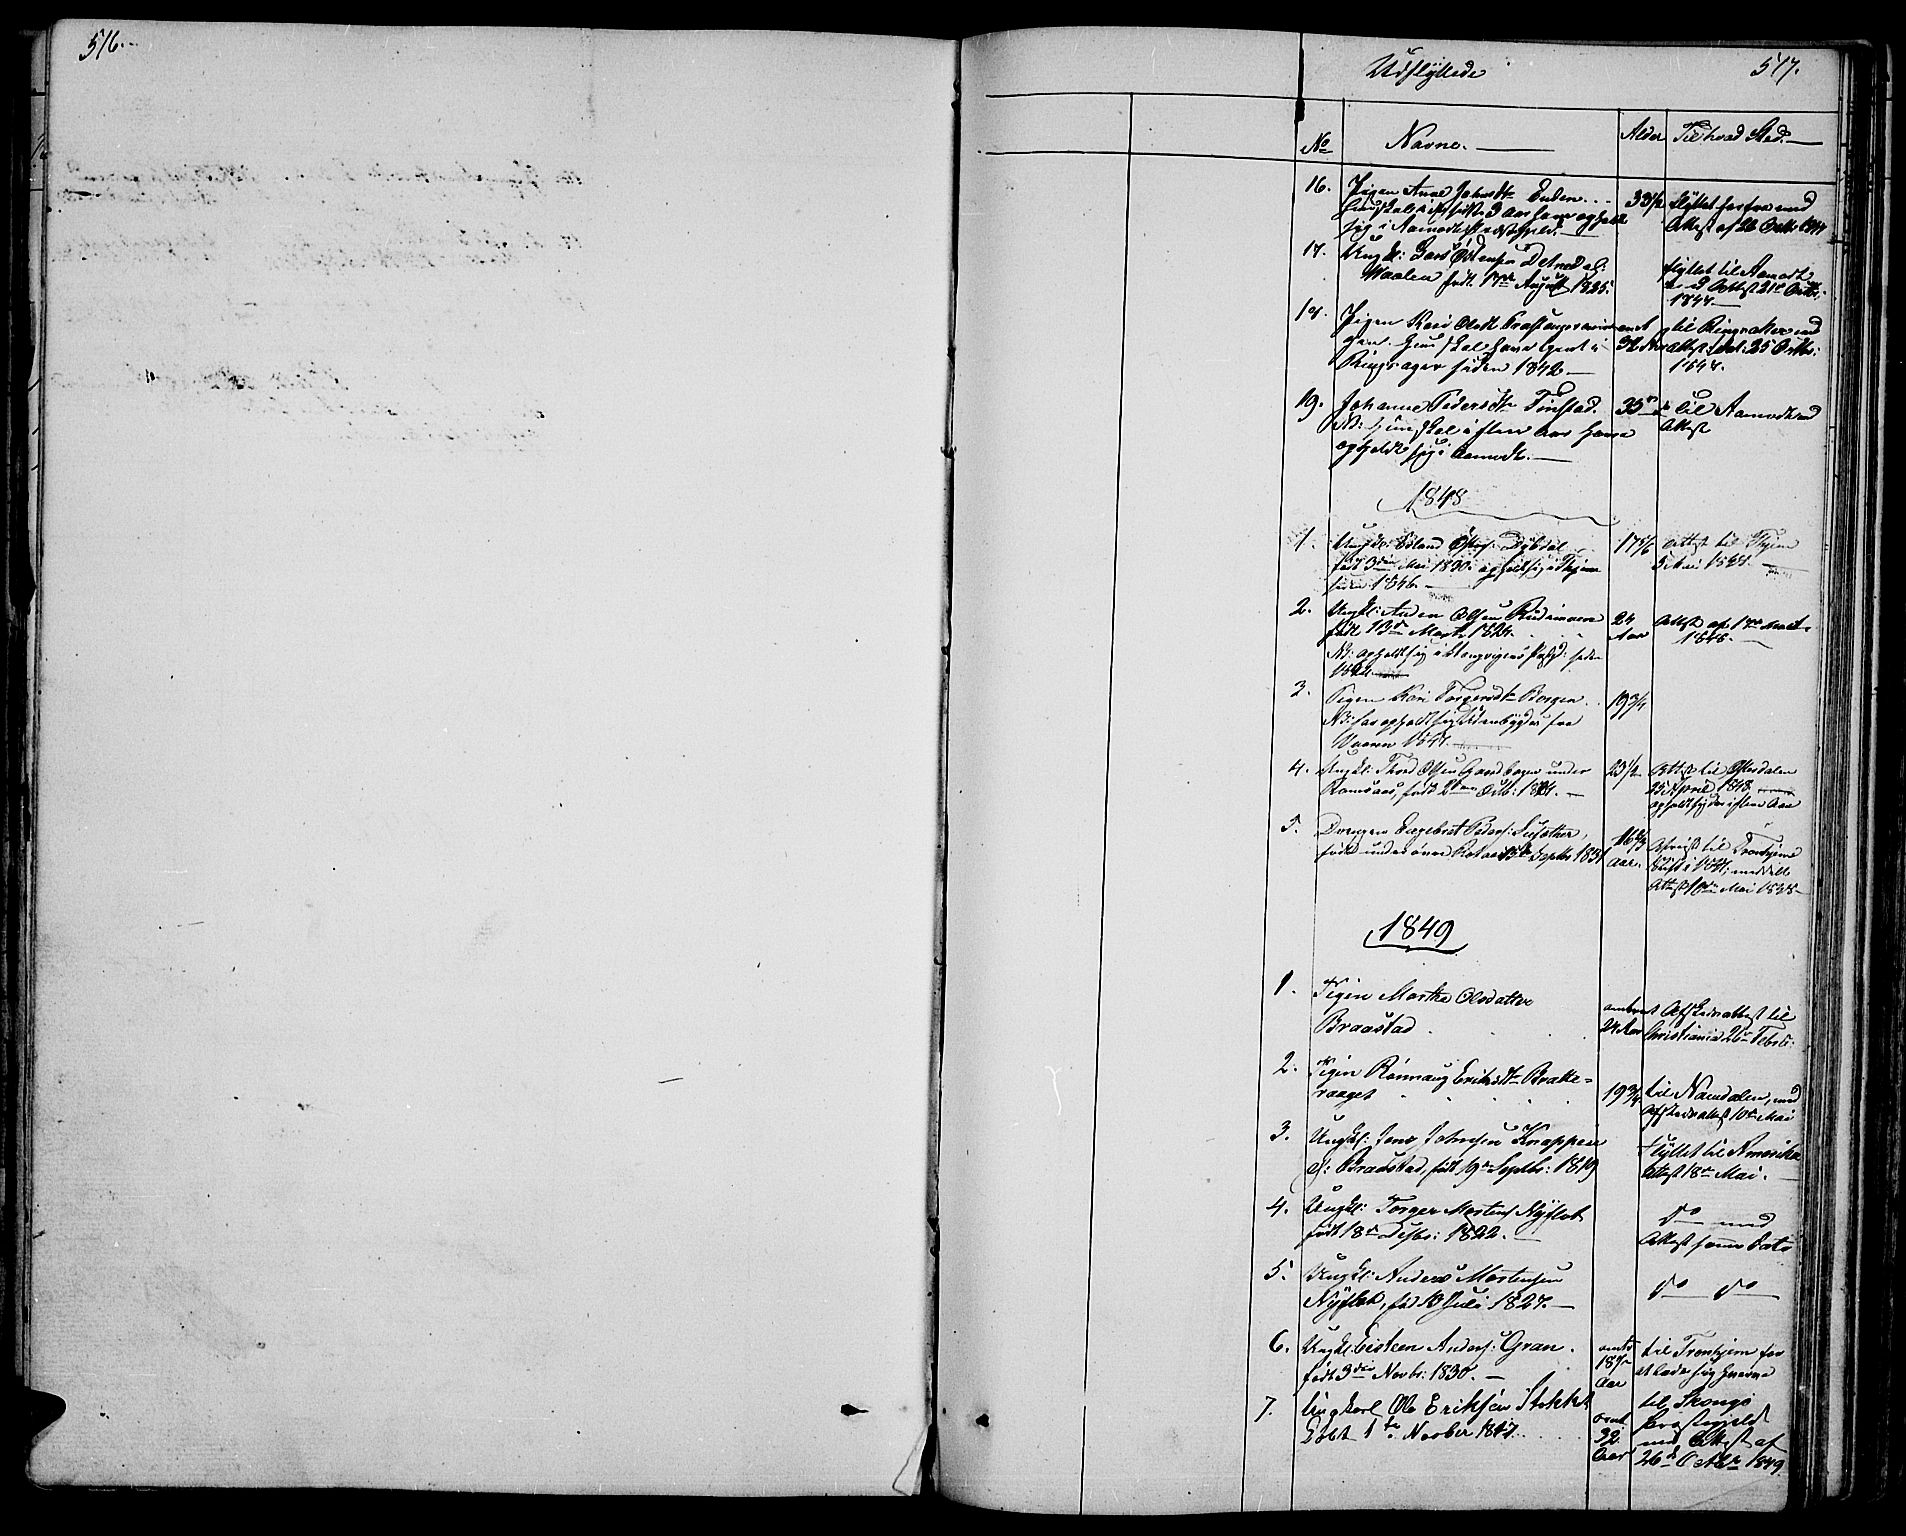 SAH, Ringebu prestekontor, Klokkerbok nr. 2, 1839-1853, s. 516-517